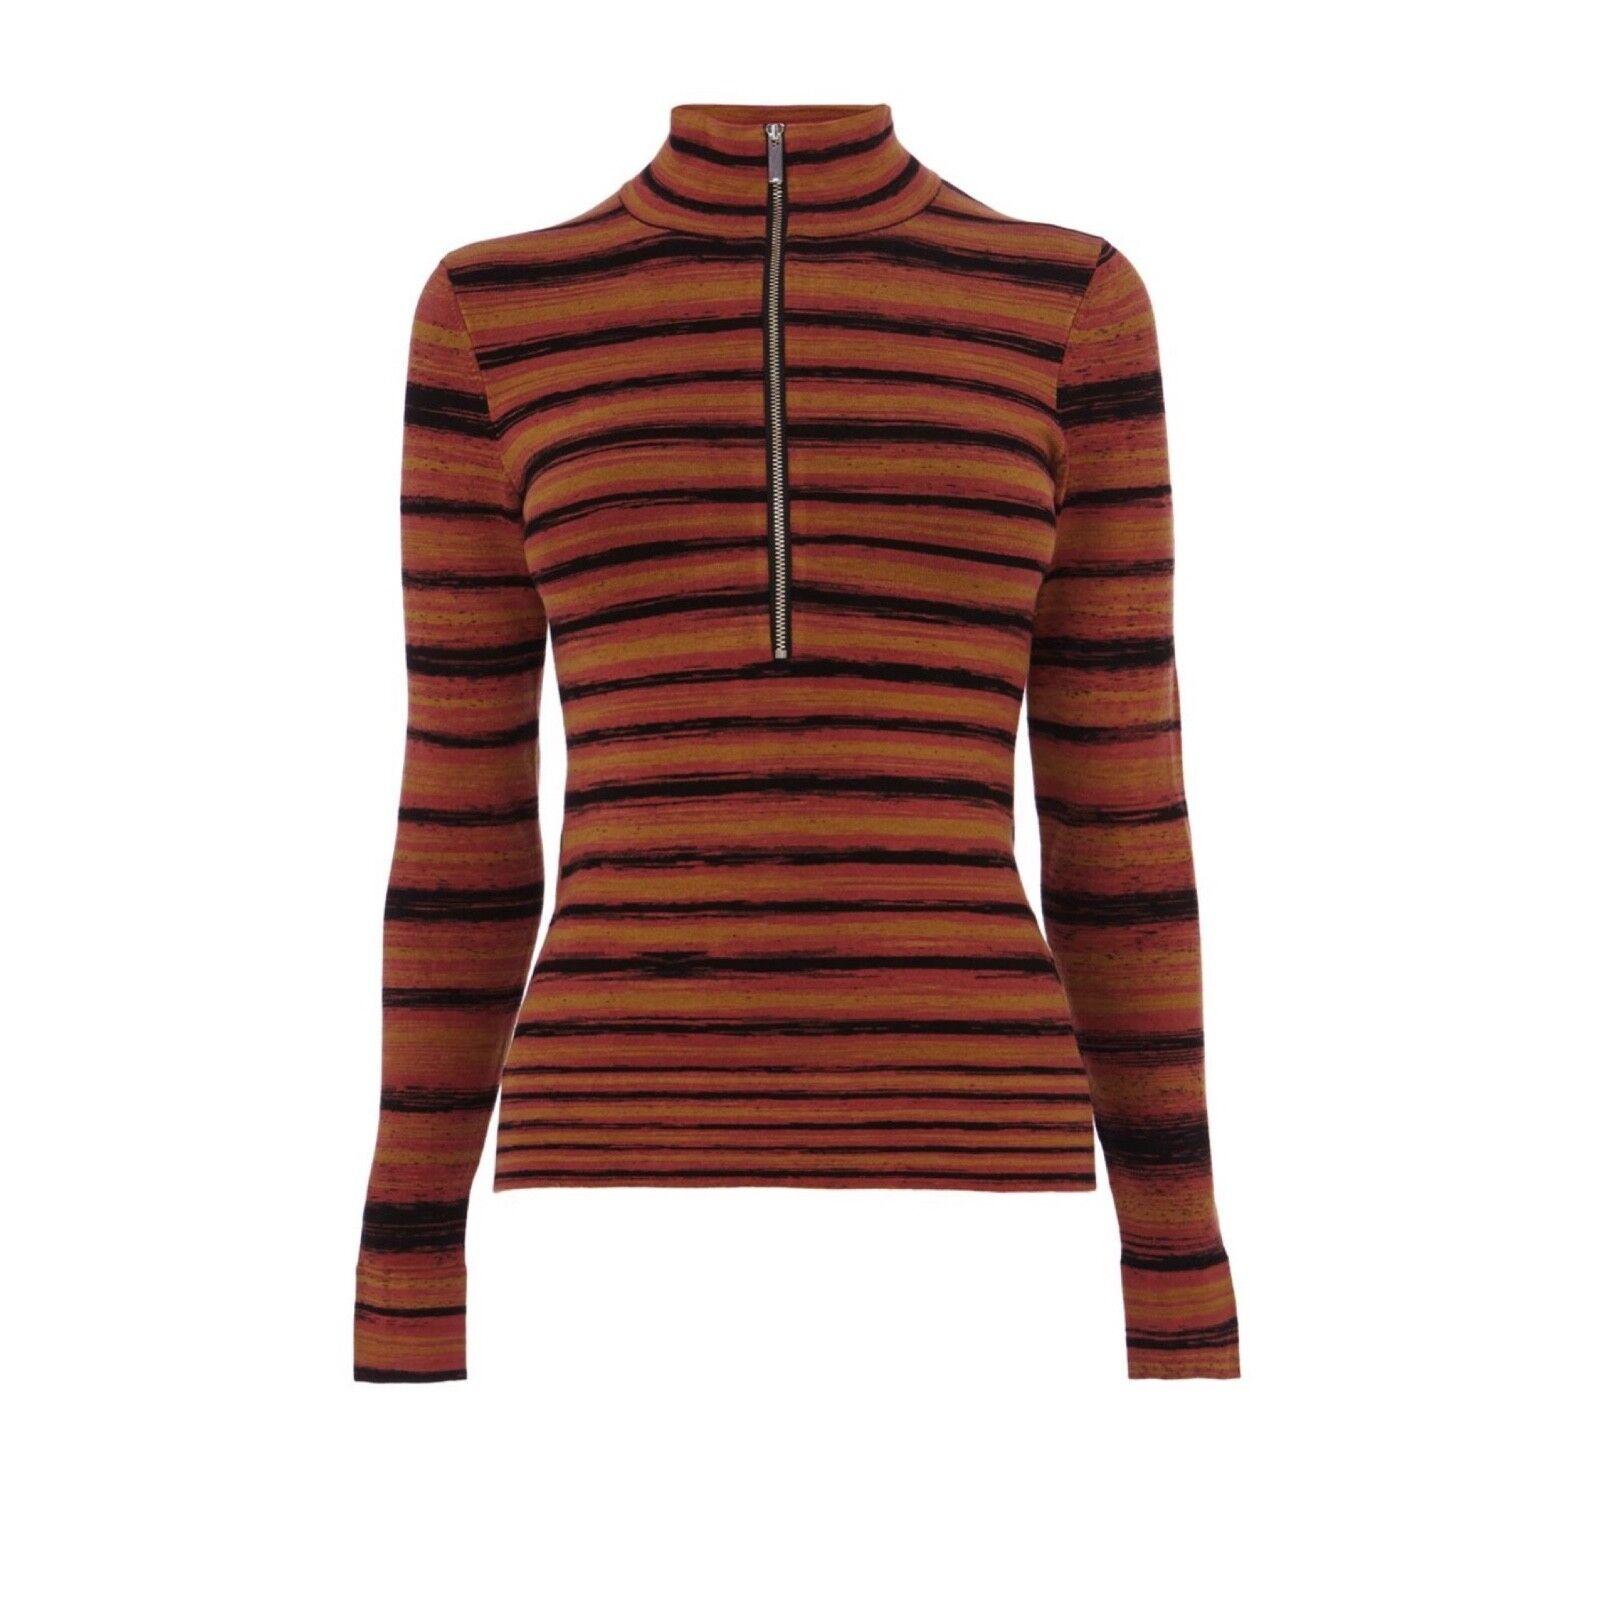 New Karen Karen Karen Millen Lightweight Space Dye sweater (Size XS) f68c8b